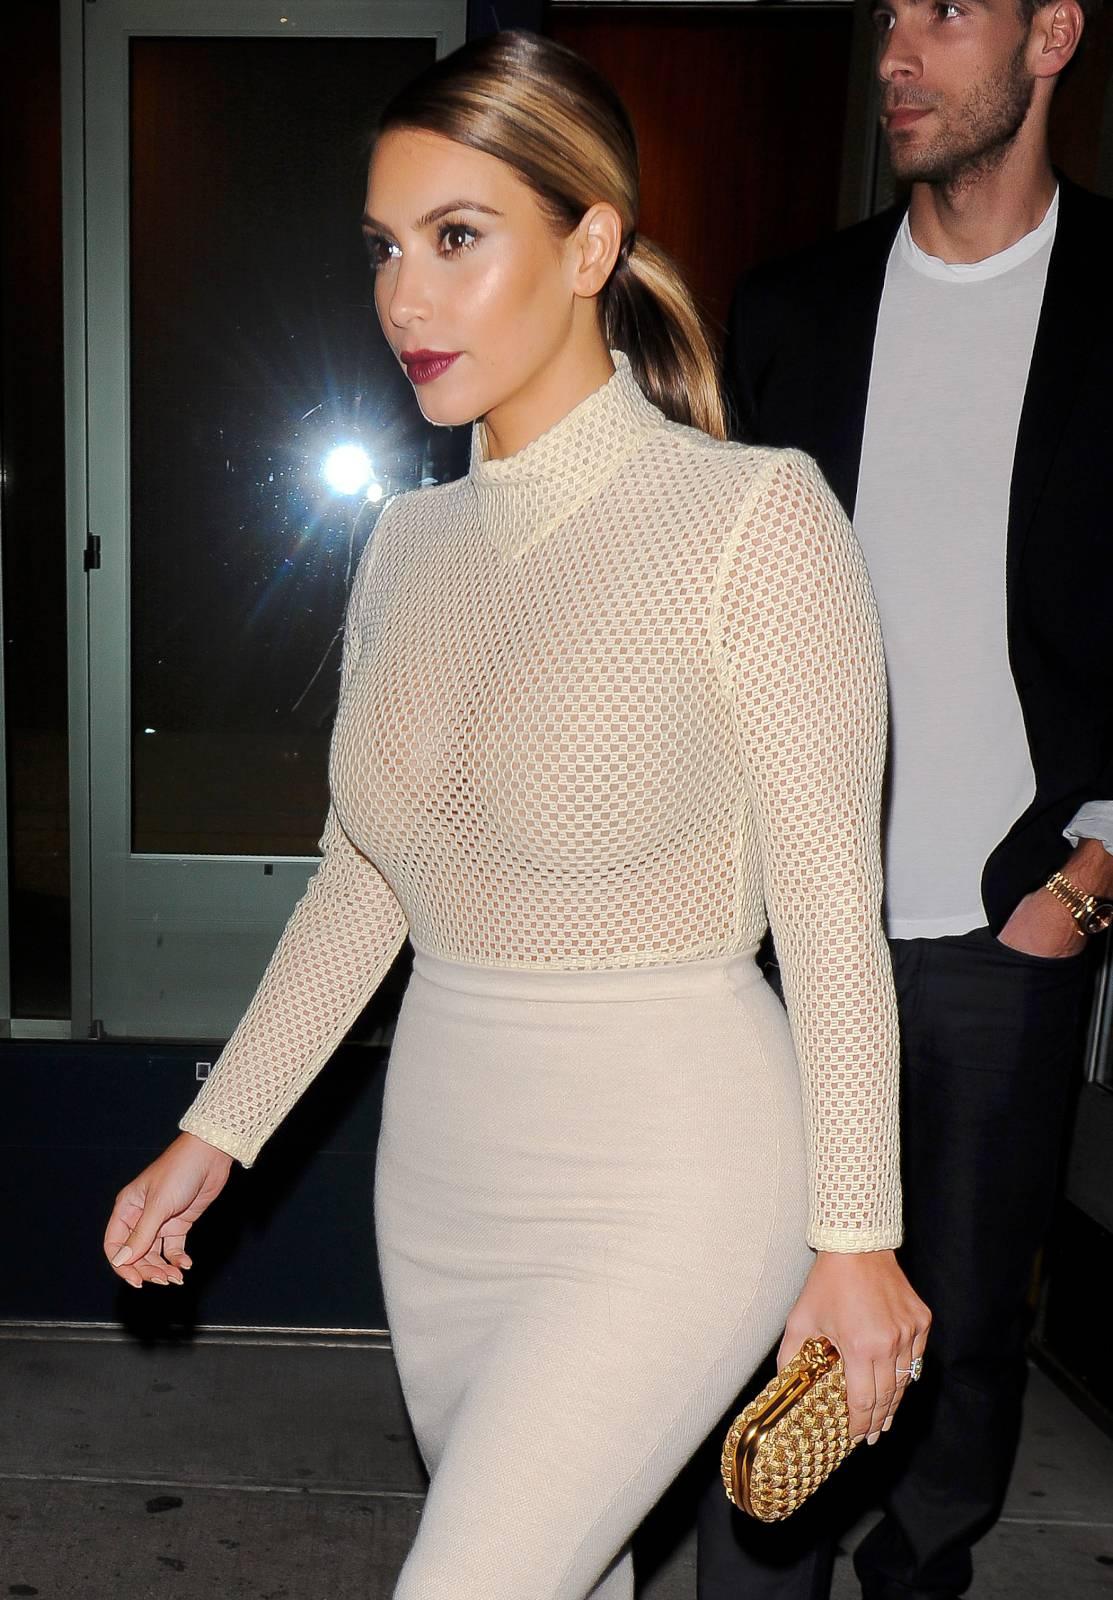 904201732_Kim_Kardashian_191113_ReSiDuO2_123_585lo.jpg